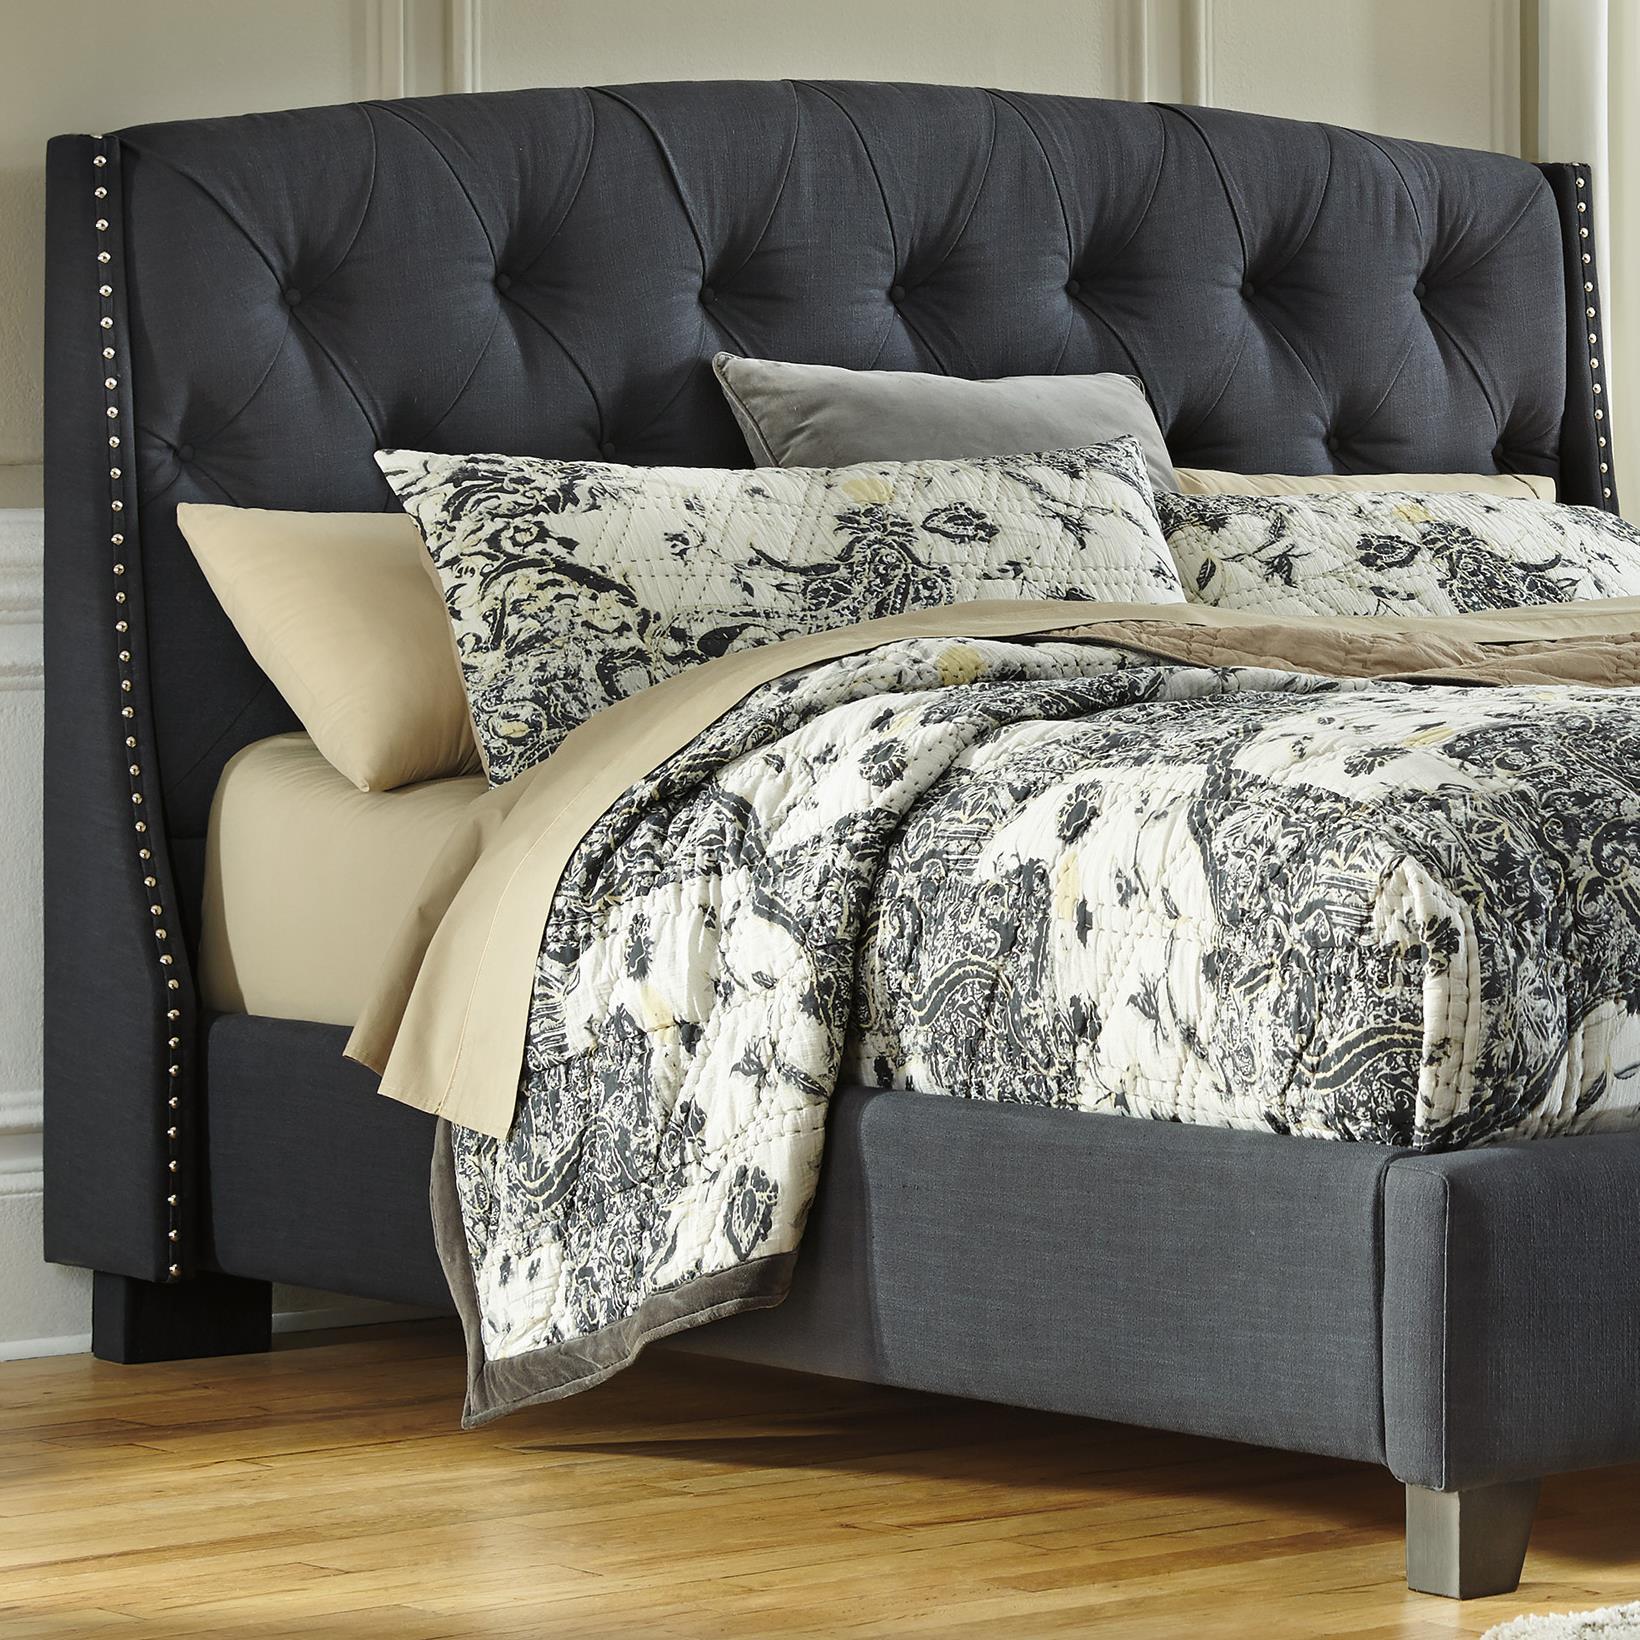 signature design by ashley kasidon b600 558 king california king upholstered headboard. Black Bedroom Furniture Sets. Home Design Ideas